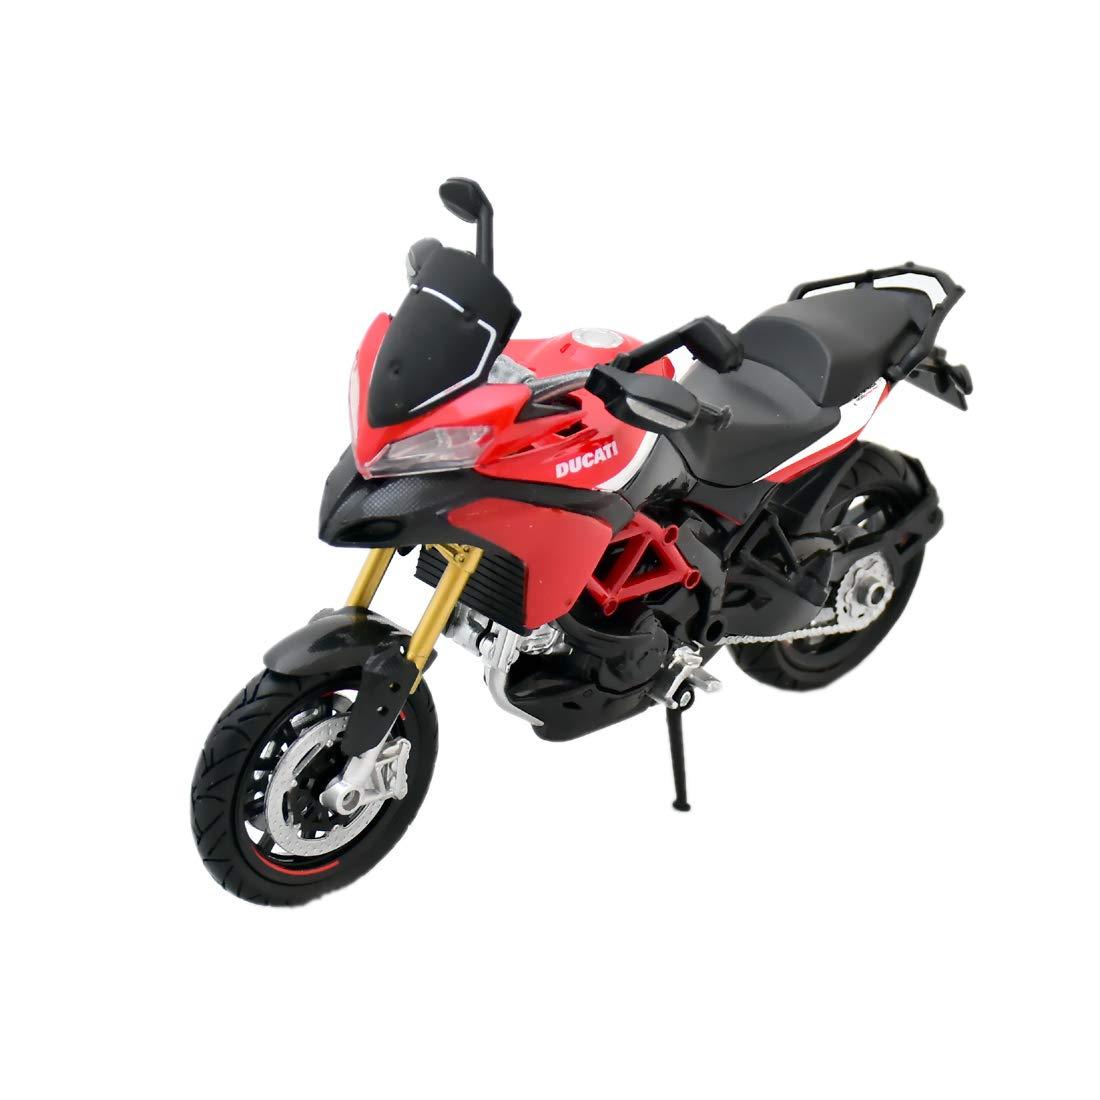 New Ray 57533 Ducati Multistrada 1200 S Pikes Peak - Moto